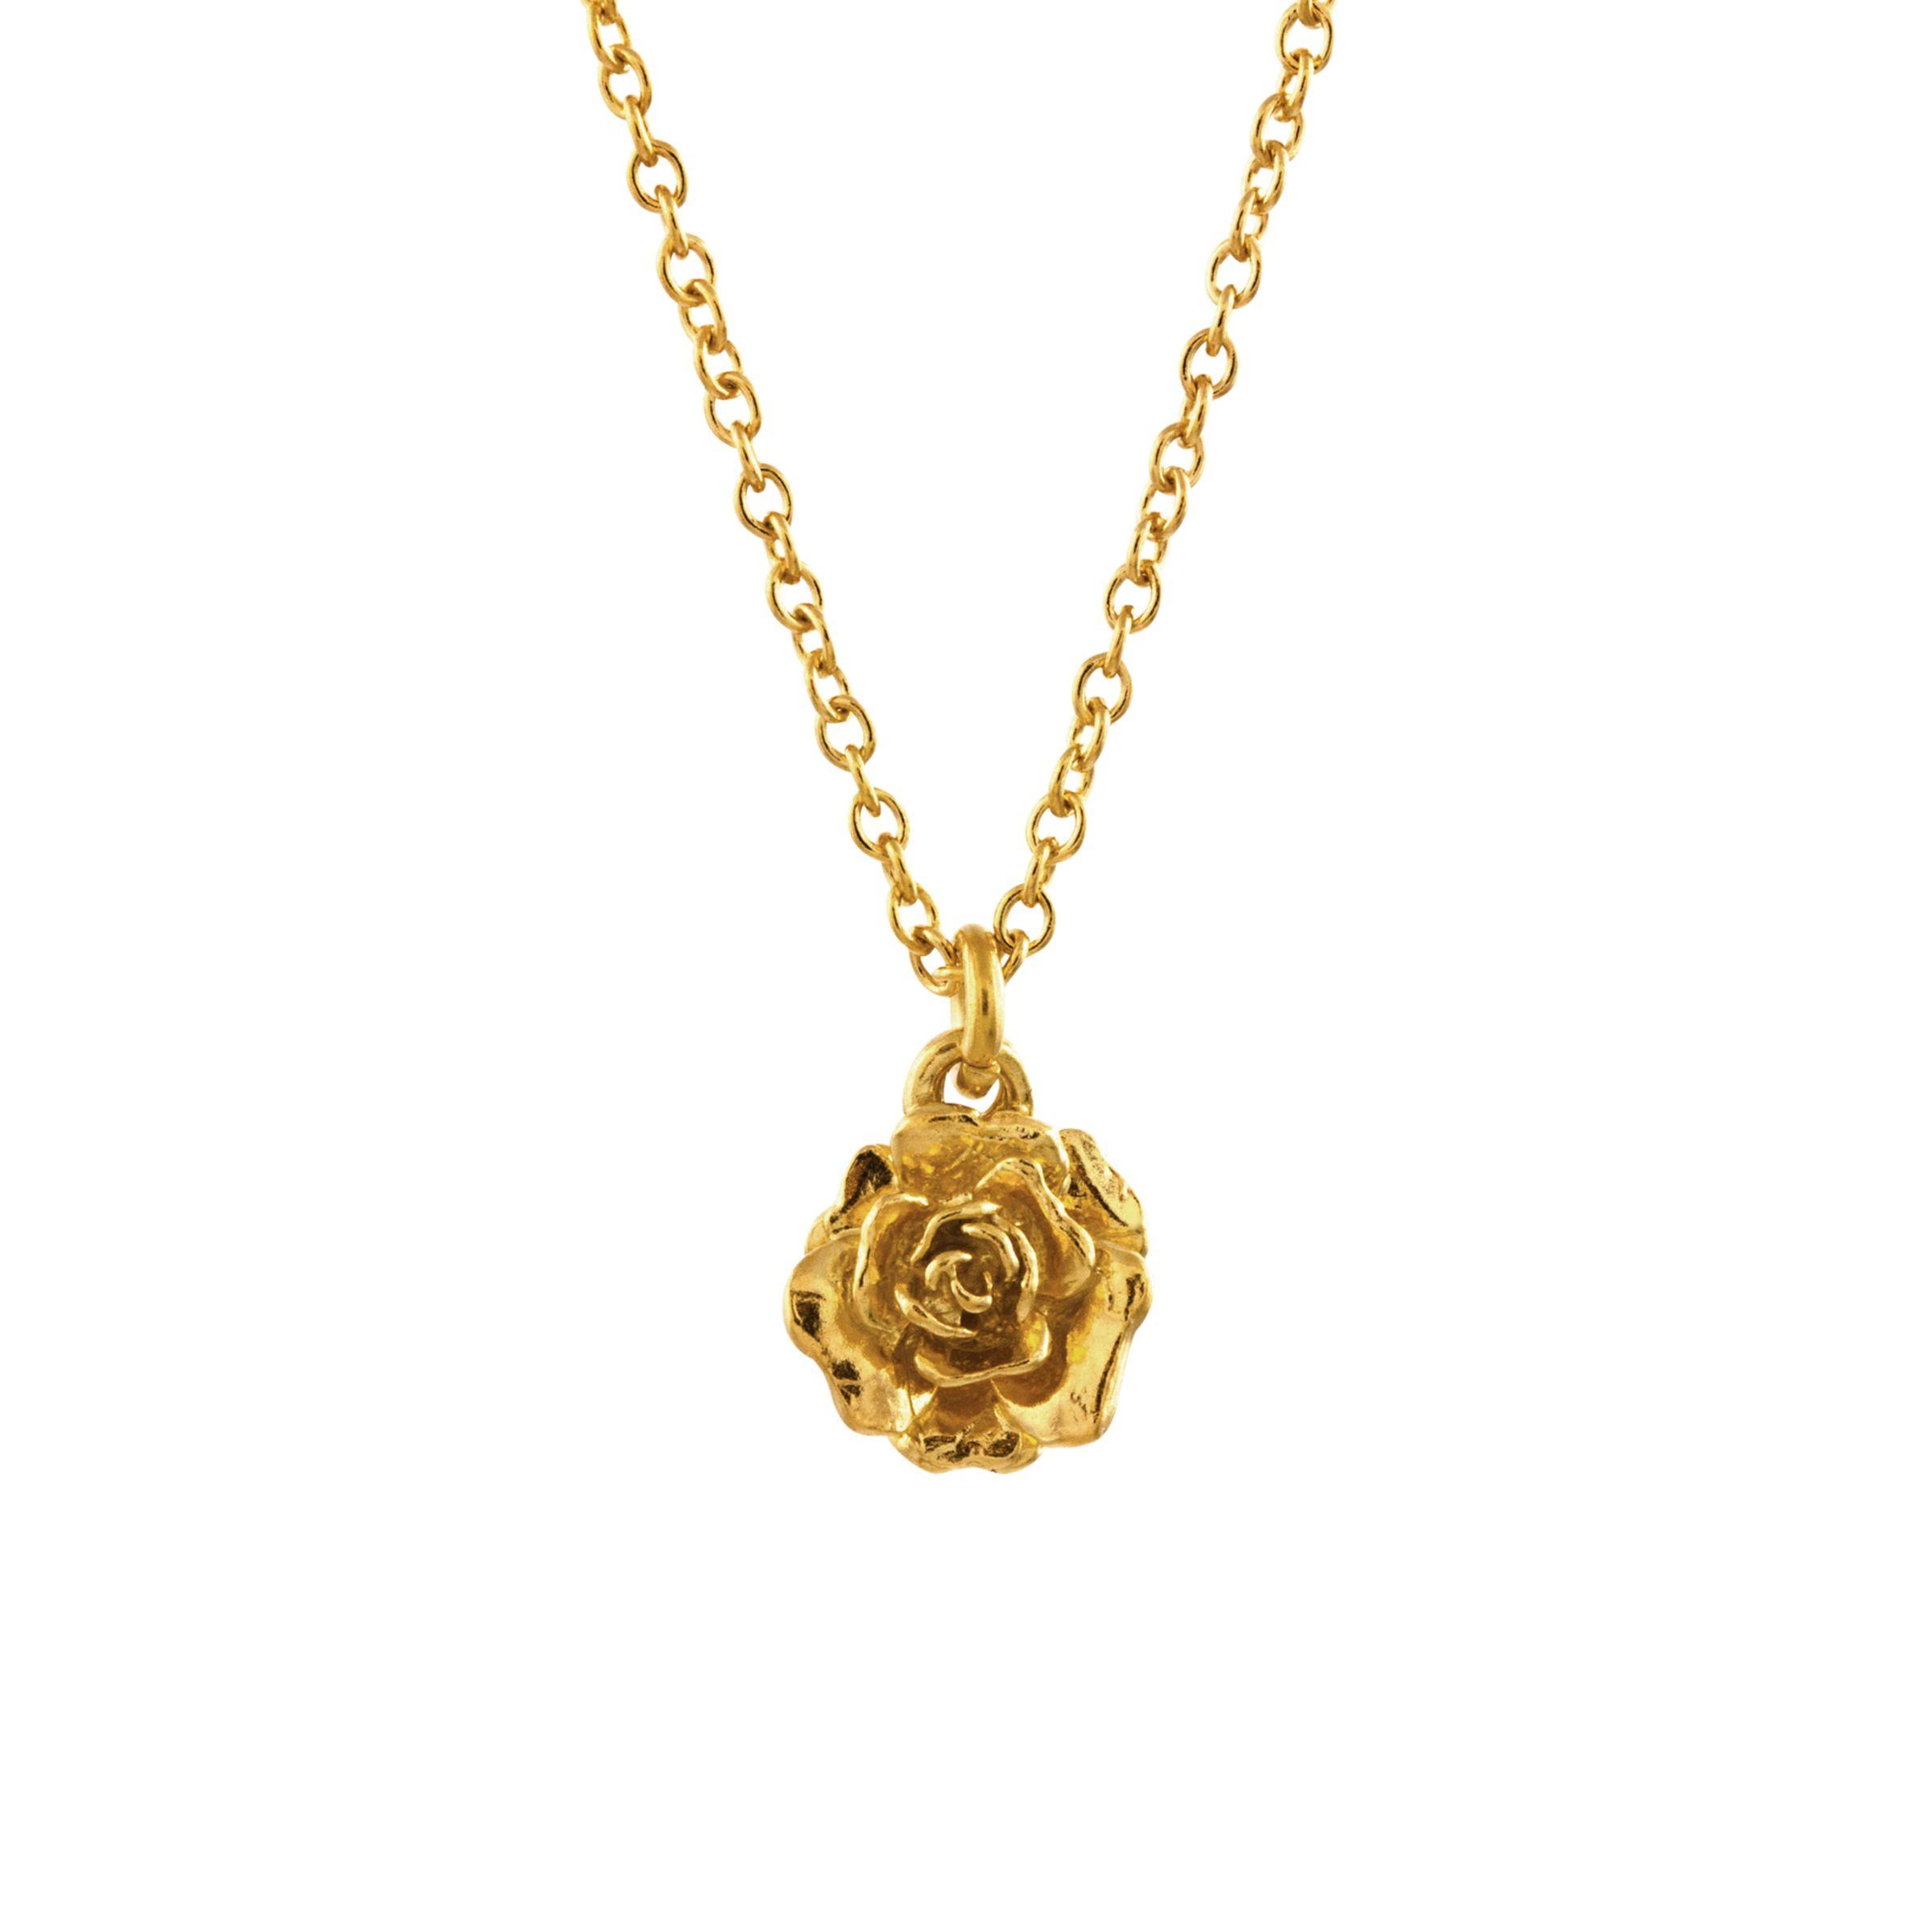 Alex Monroe Alex Monroe 22ct Gold Plated Sterling Silver Rosa Damascena Pendant Necklace, Gold